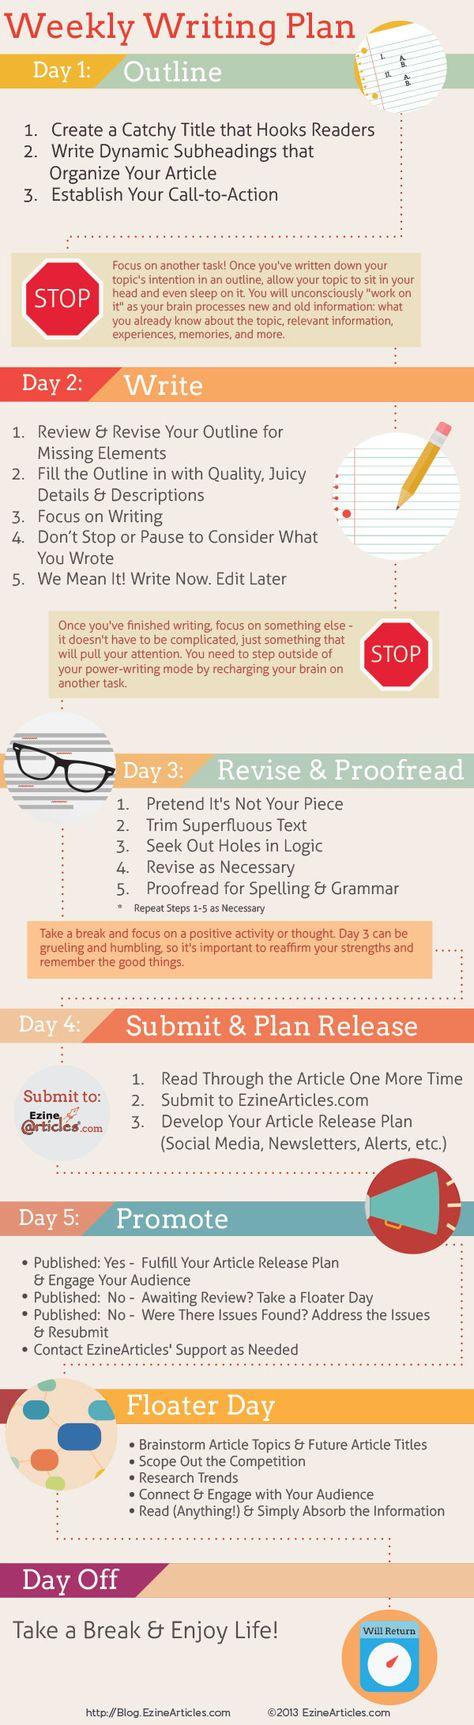 Weekly Writing Plan from ezine - Jay Artale